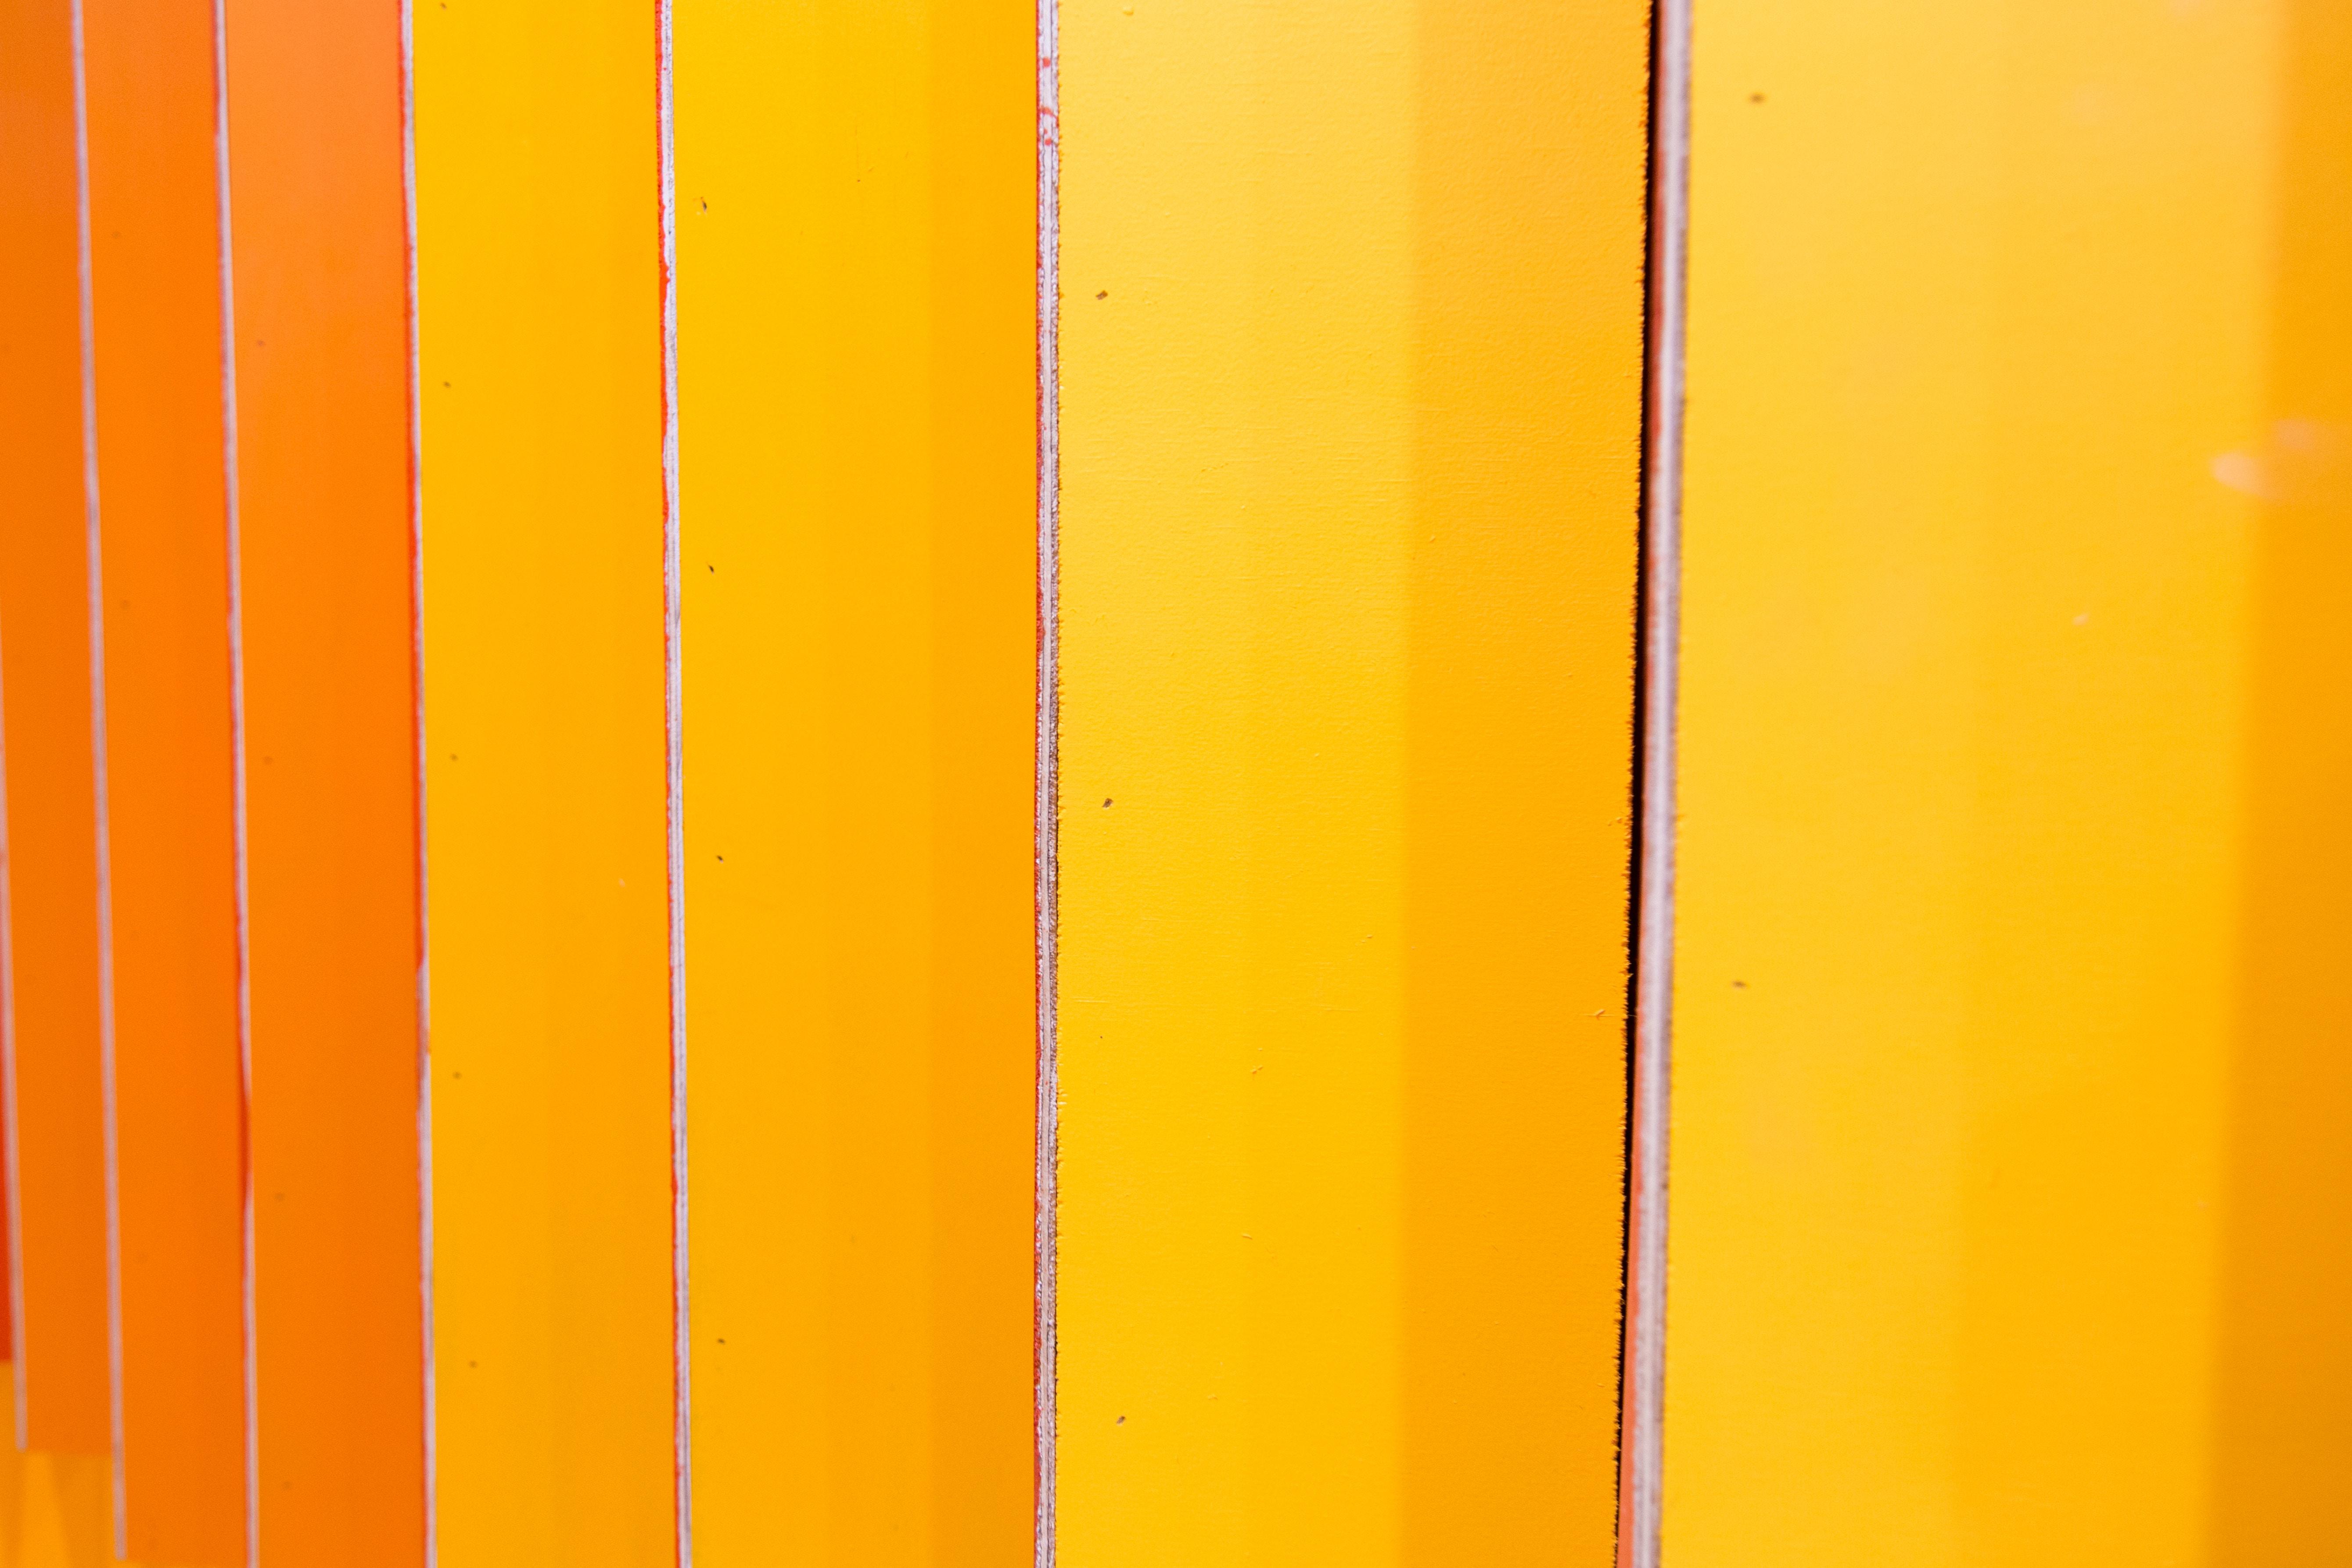 yellow and orange board